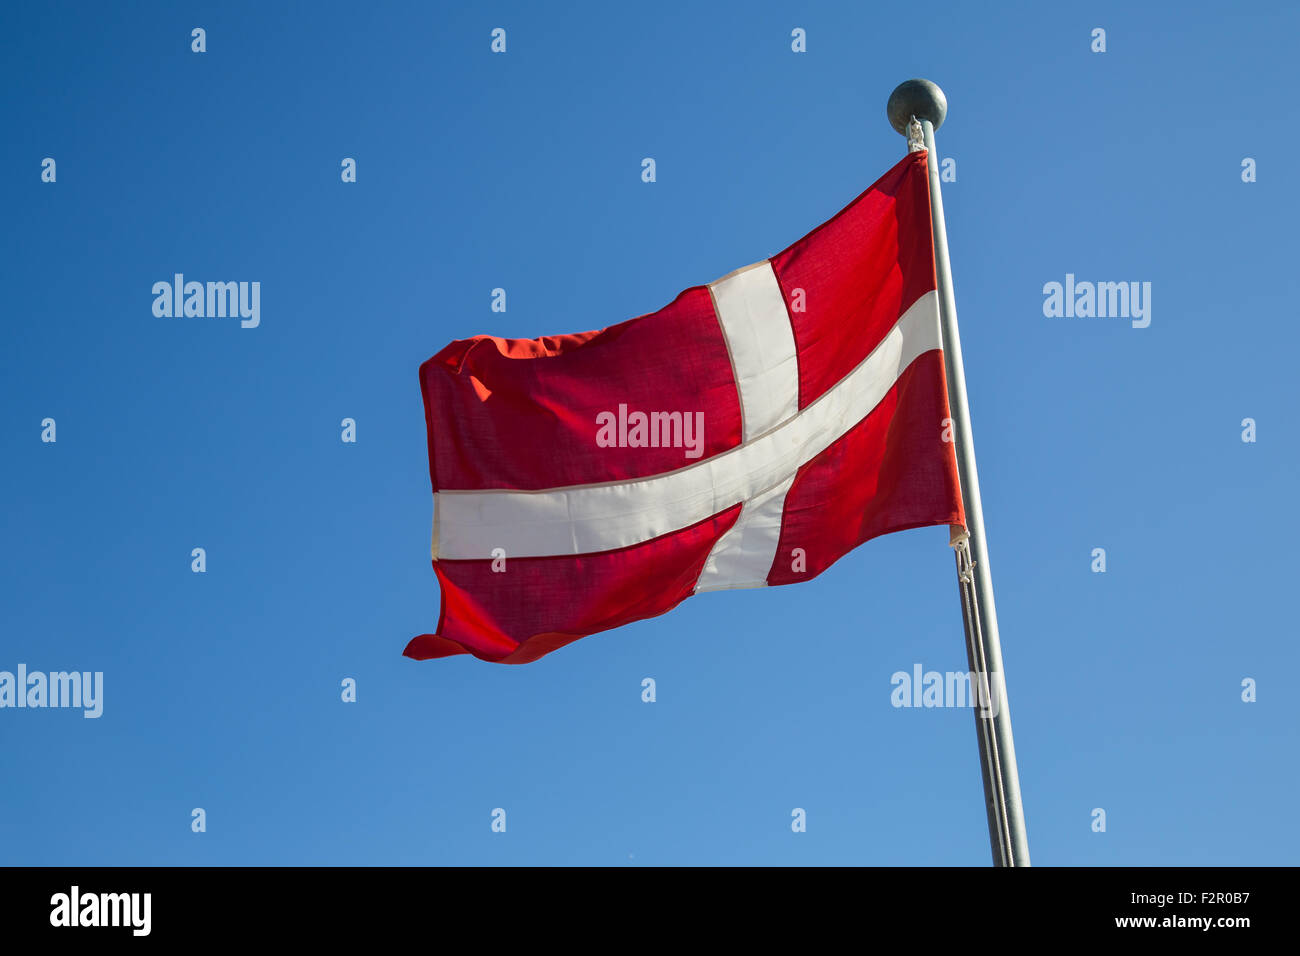 Photograph of the Danish Flag called Dannebrog. - Stock Image